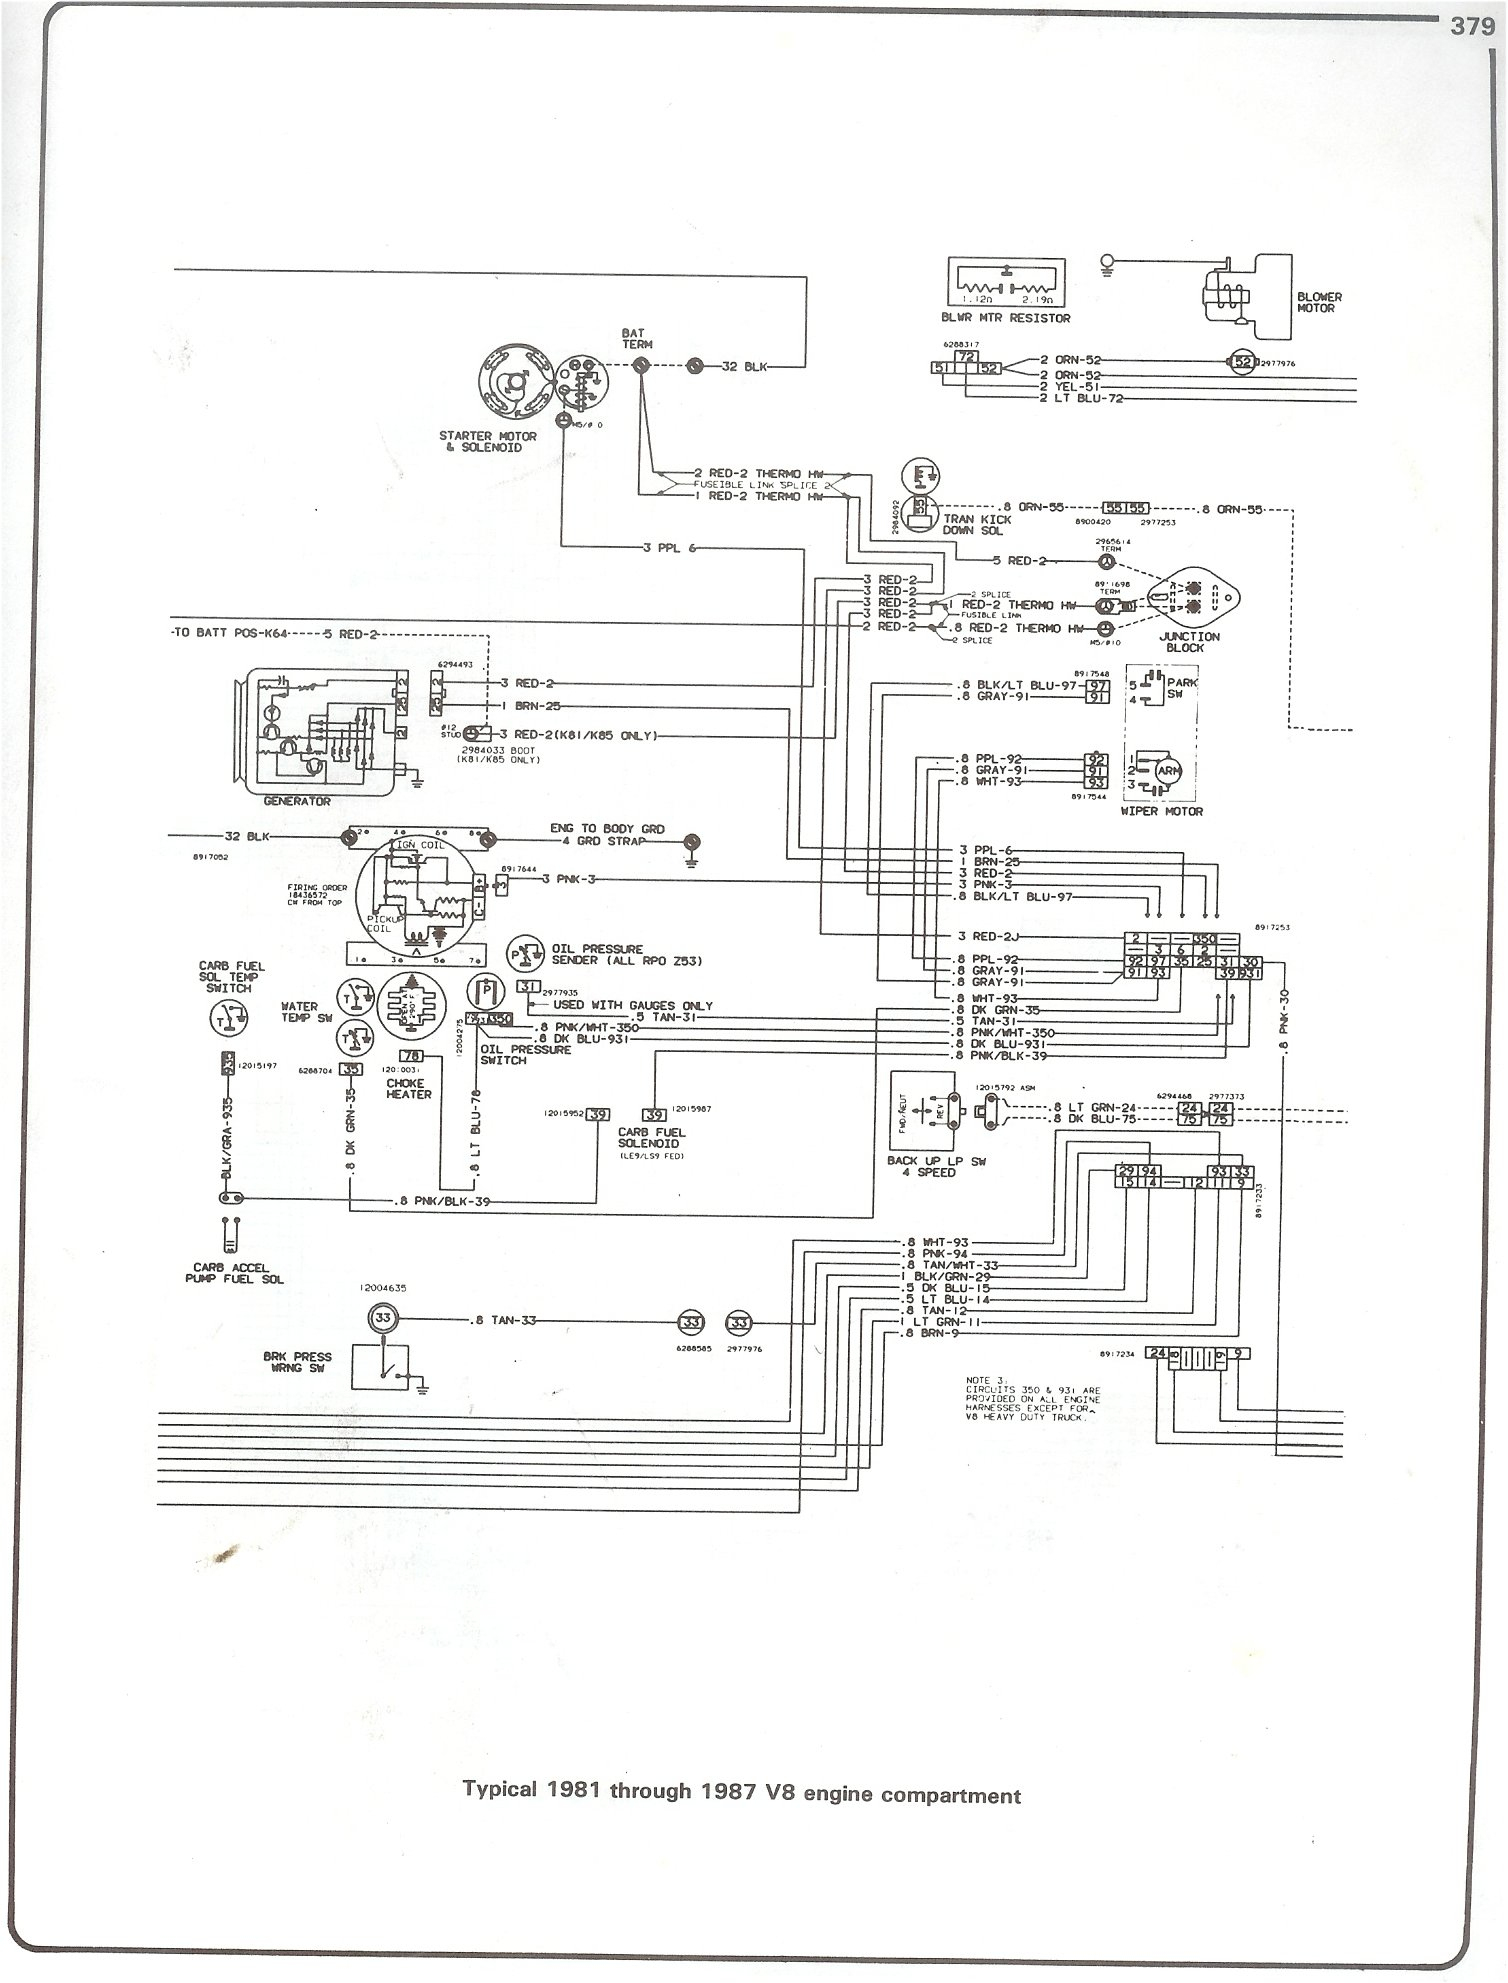 86 Chevy Truck Wiring Harness | Wiring Diagram - 87 Chevy Truck Wiring Diagram